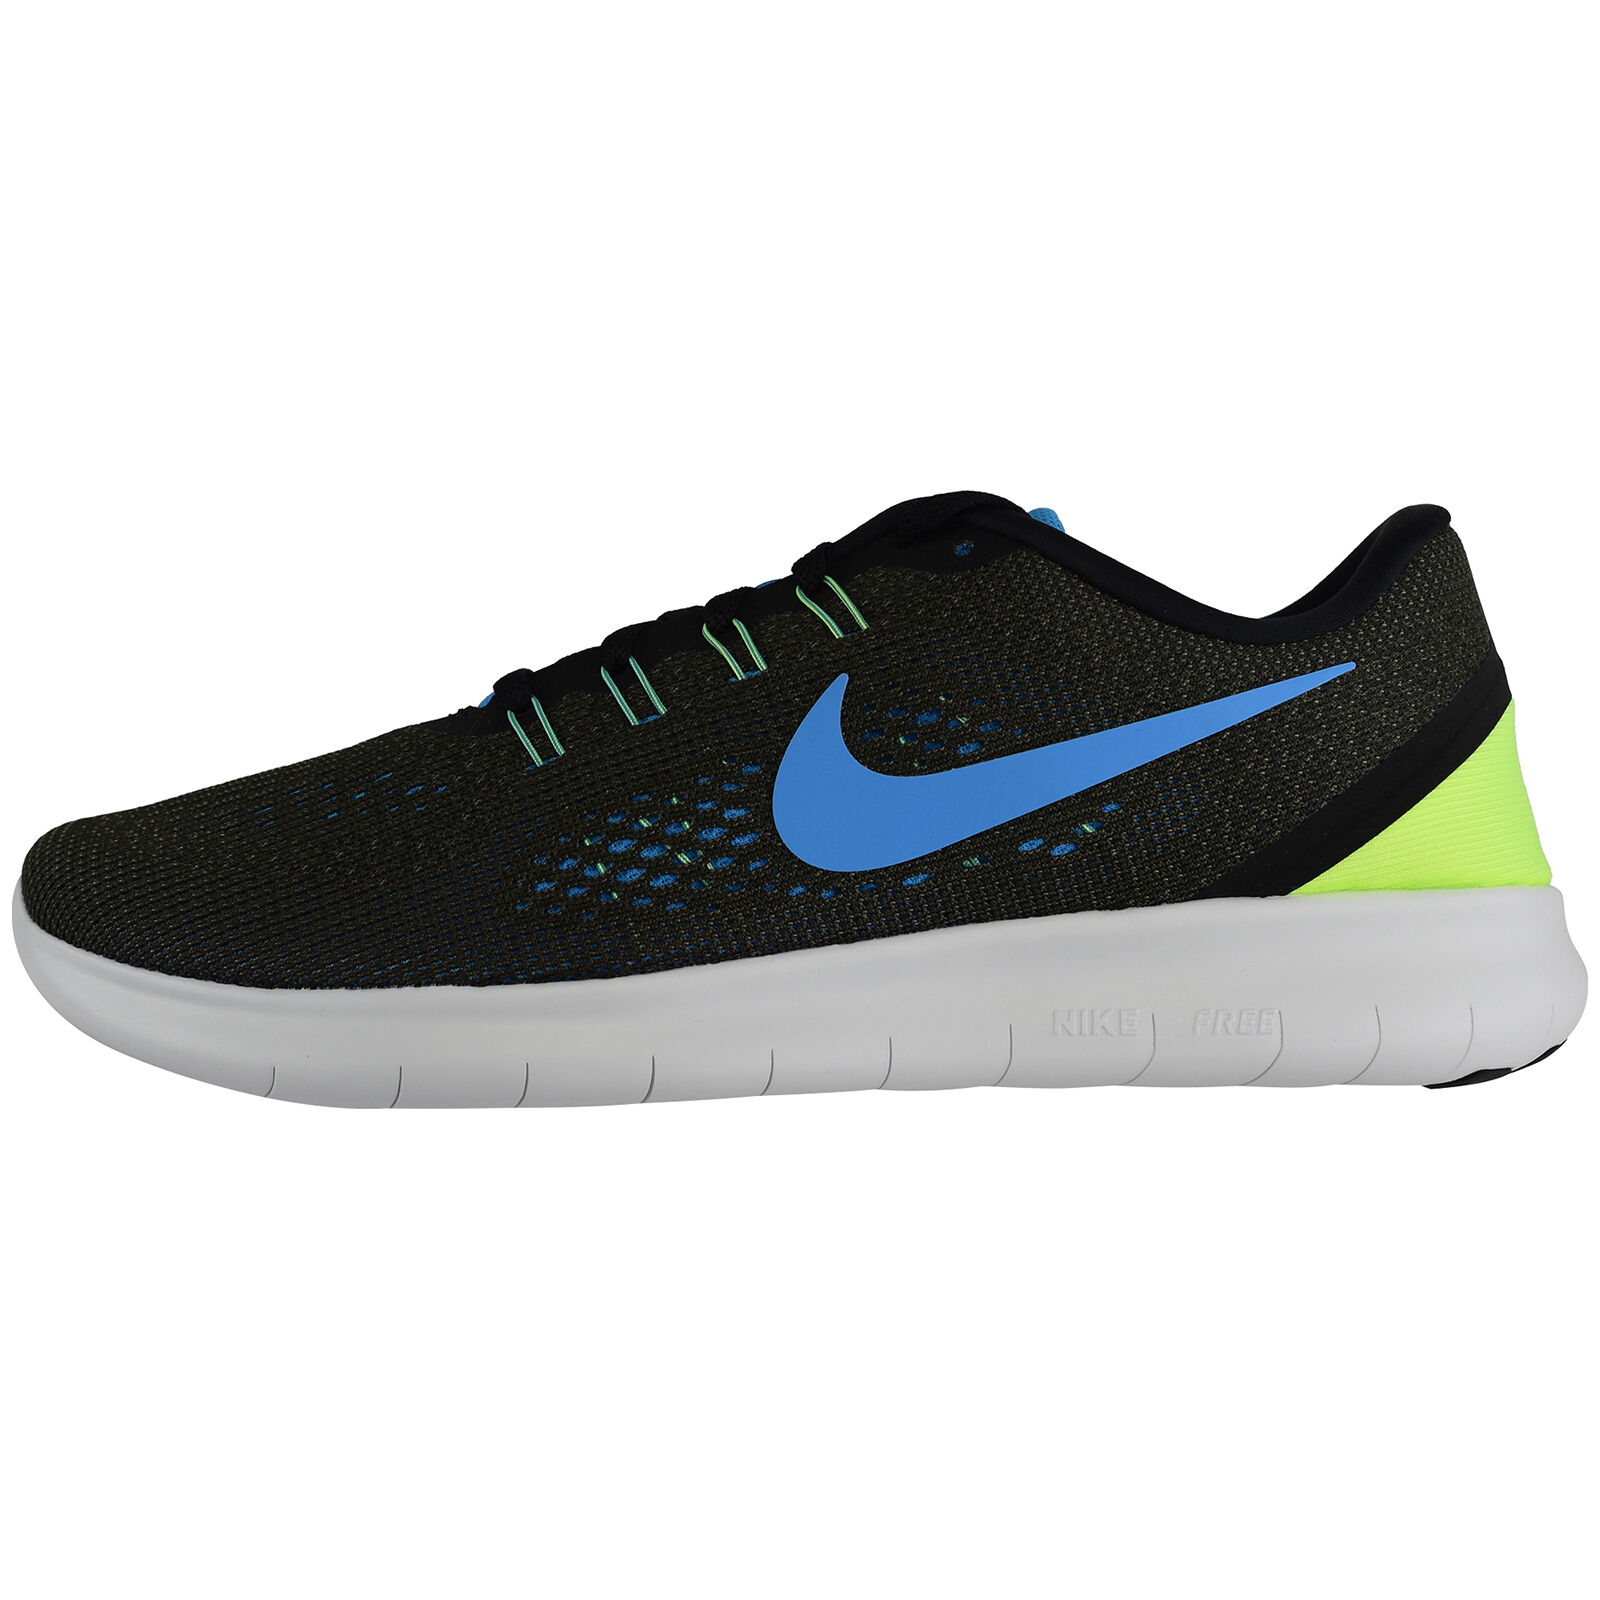 Nike libera rn 831508-301 lo stile di vita laufschuhe laufen correndo freizeit scarpa